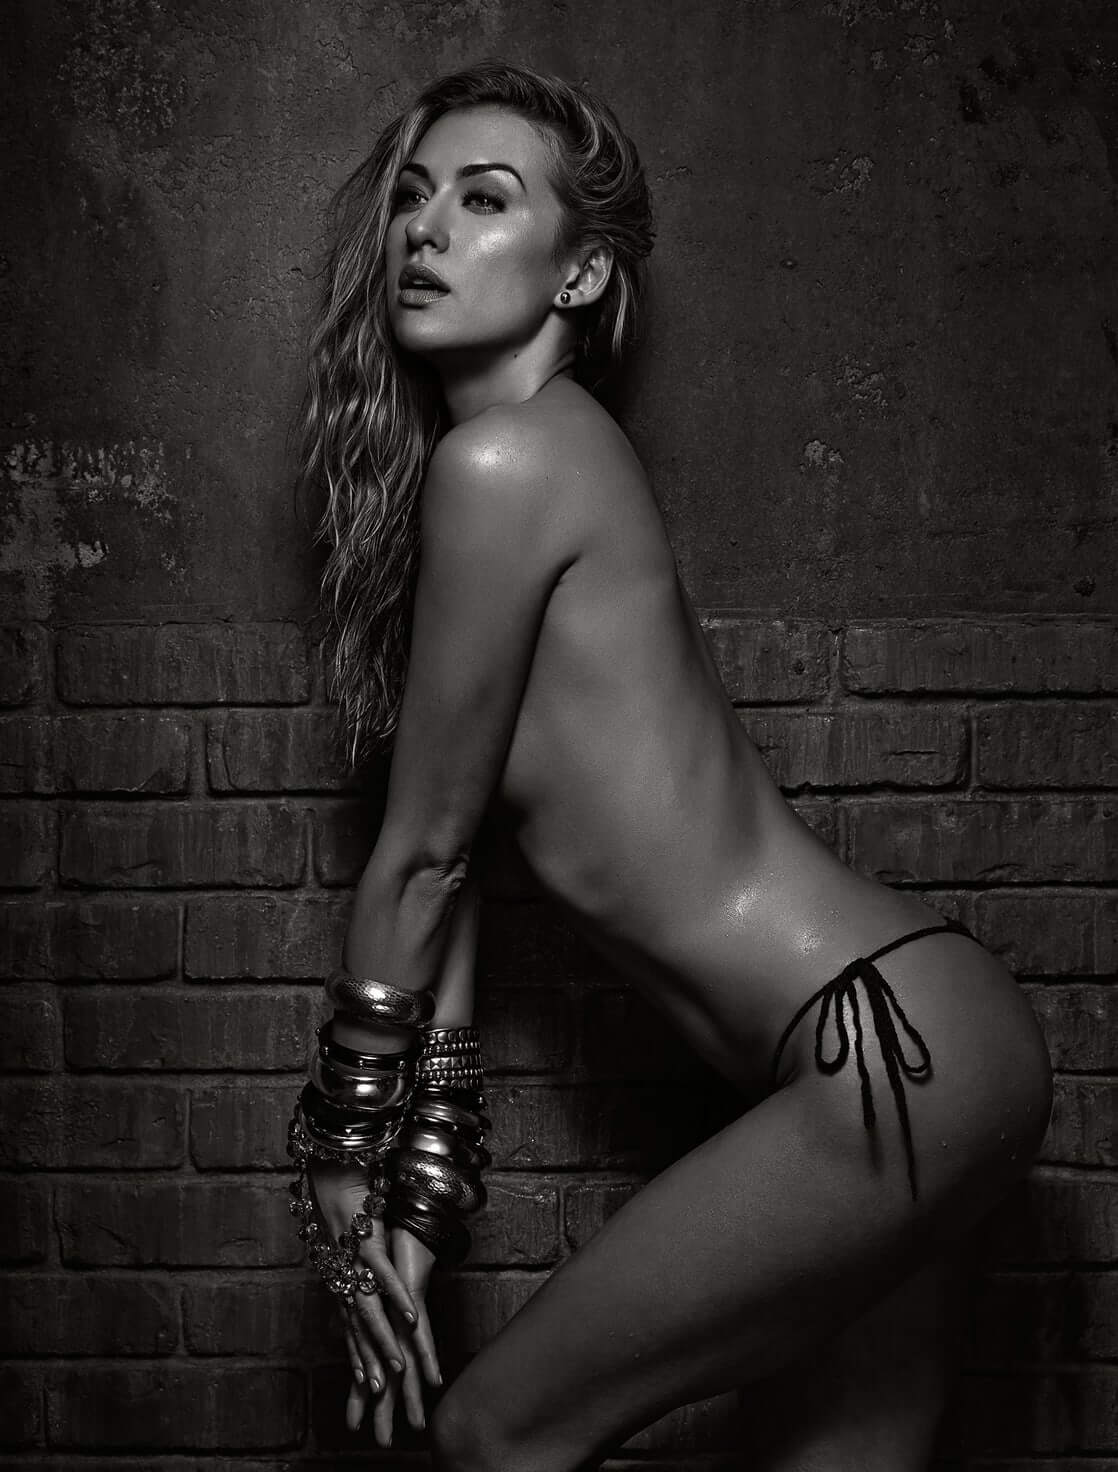 Tasya Teles topless